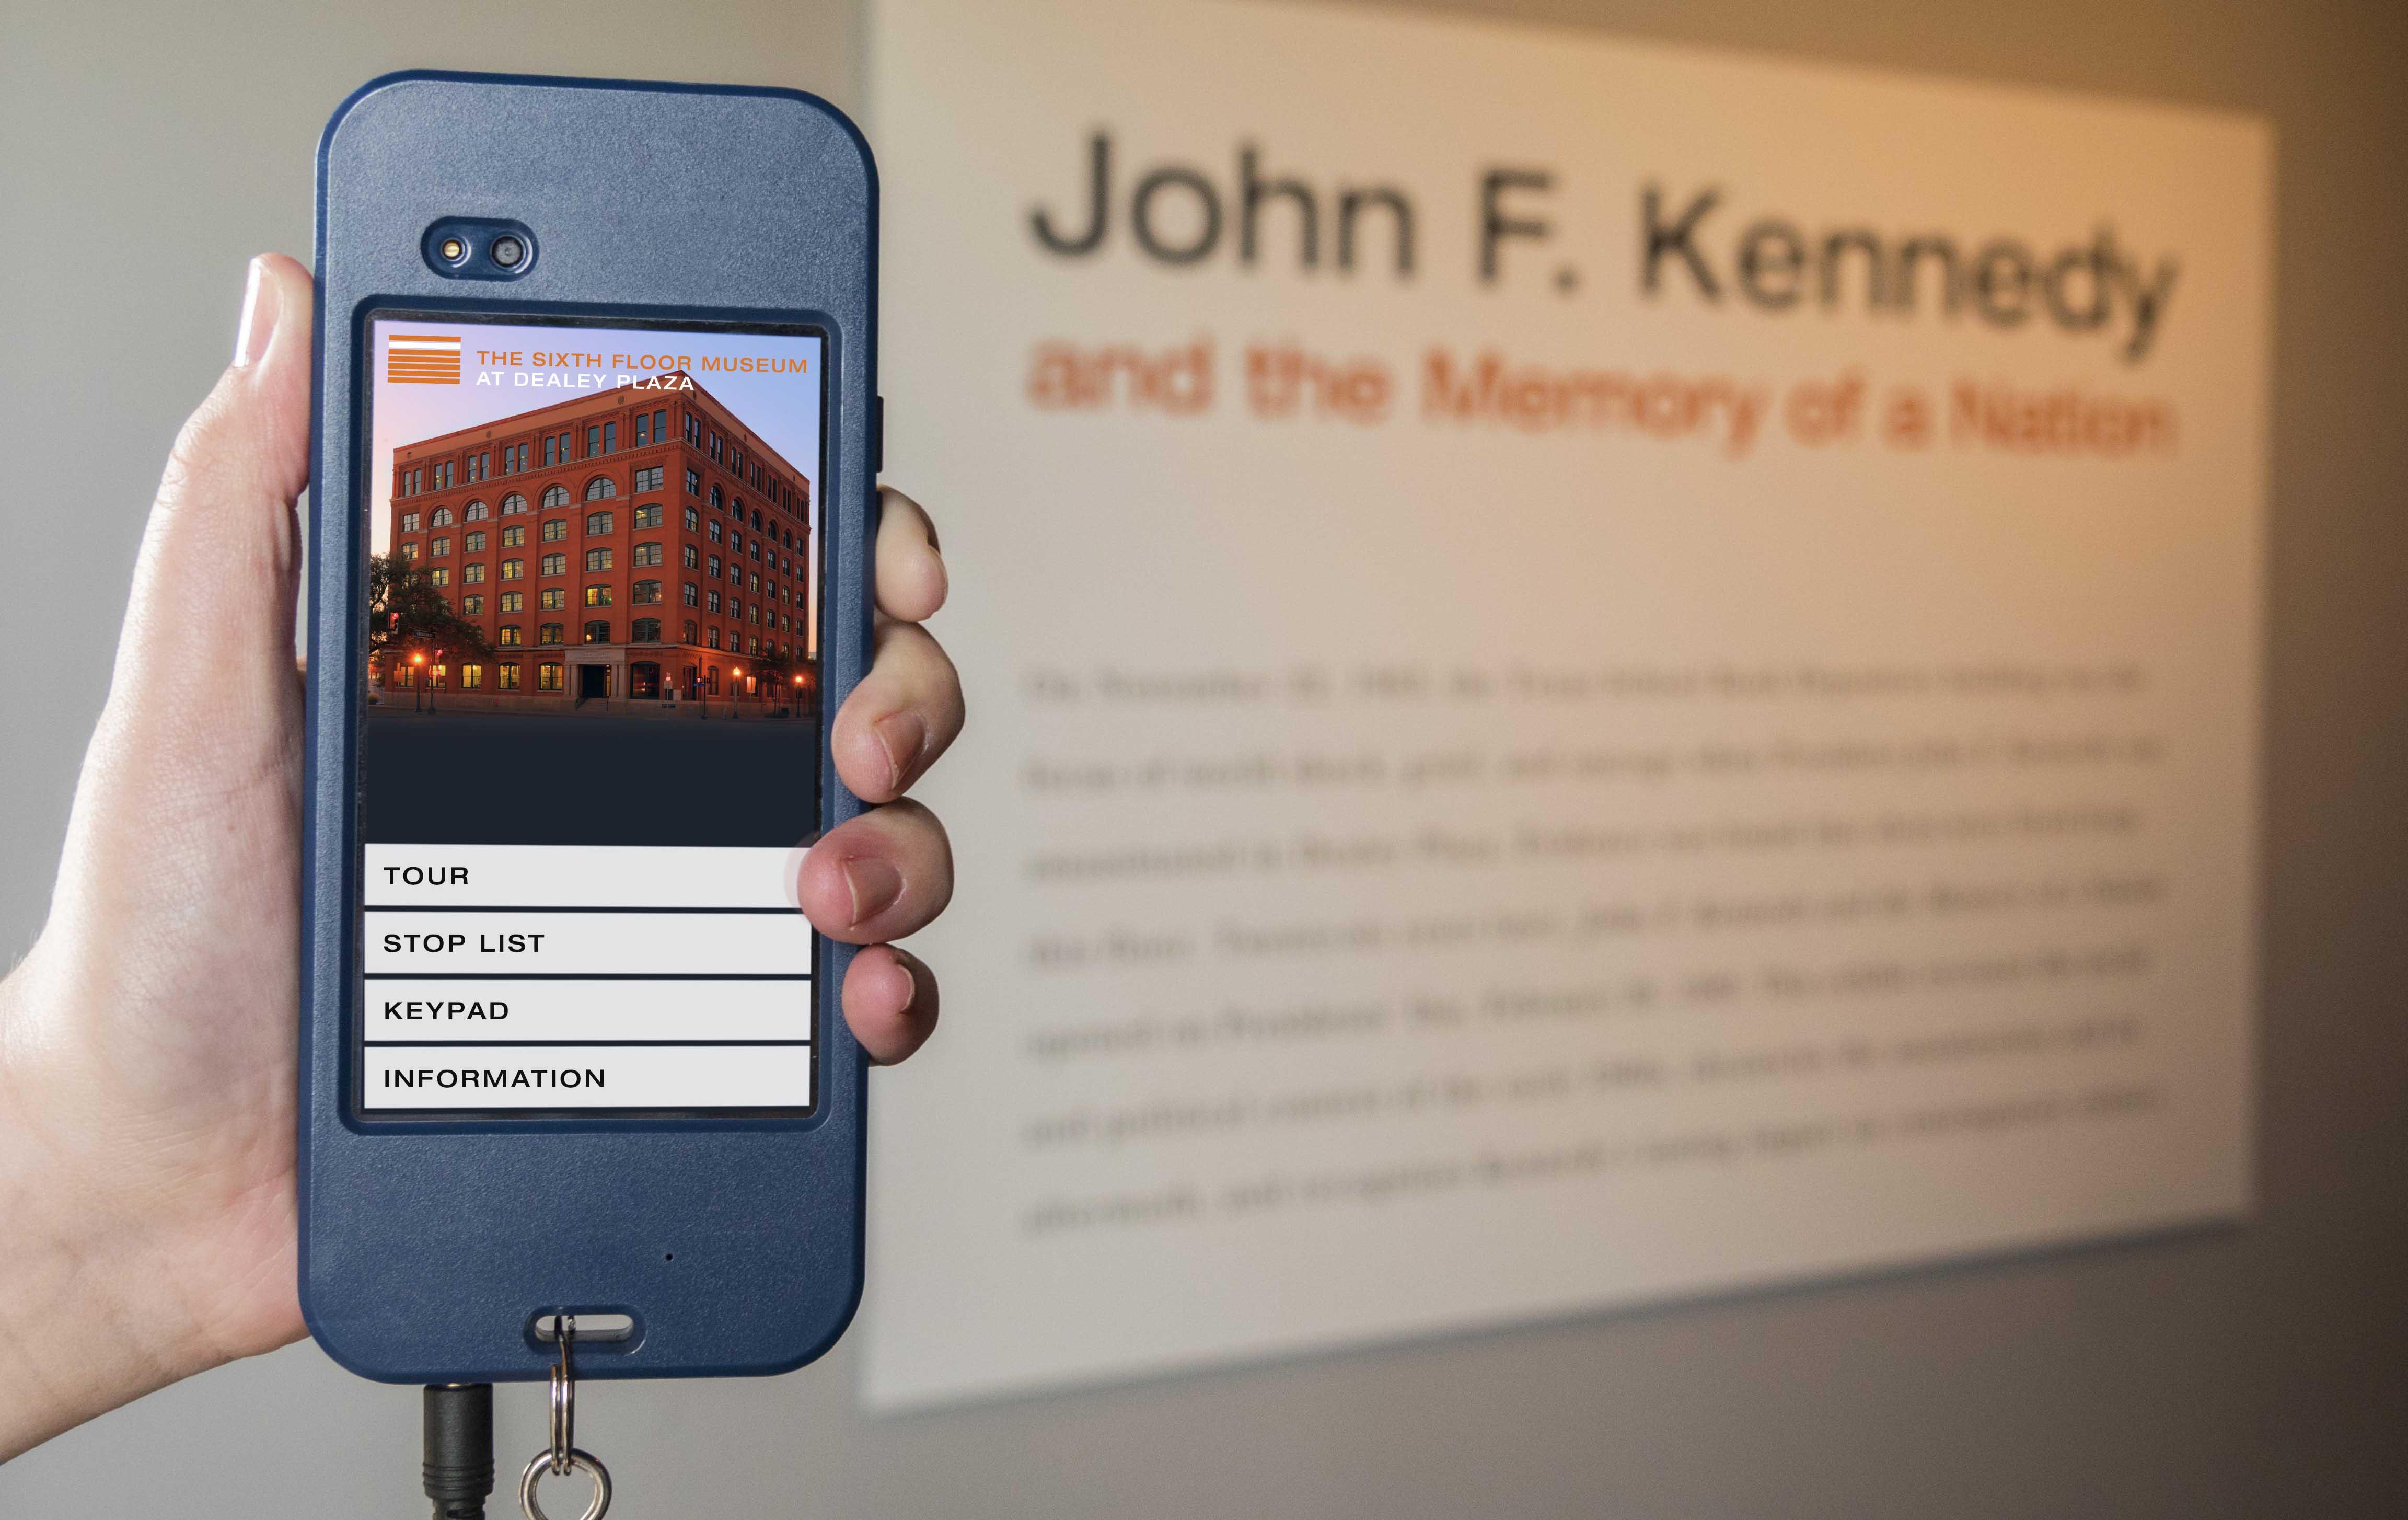 Exhibits  The Sixth Floor Museum at Dealey PlazaThe Sixth